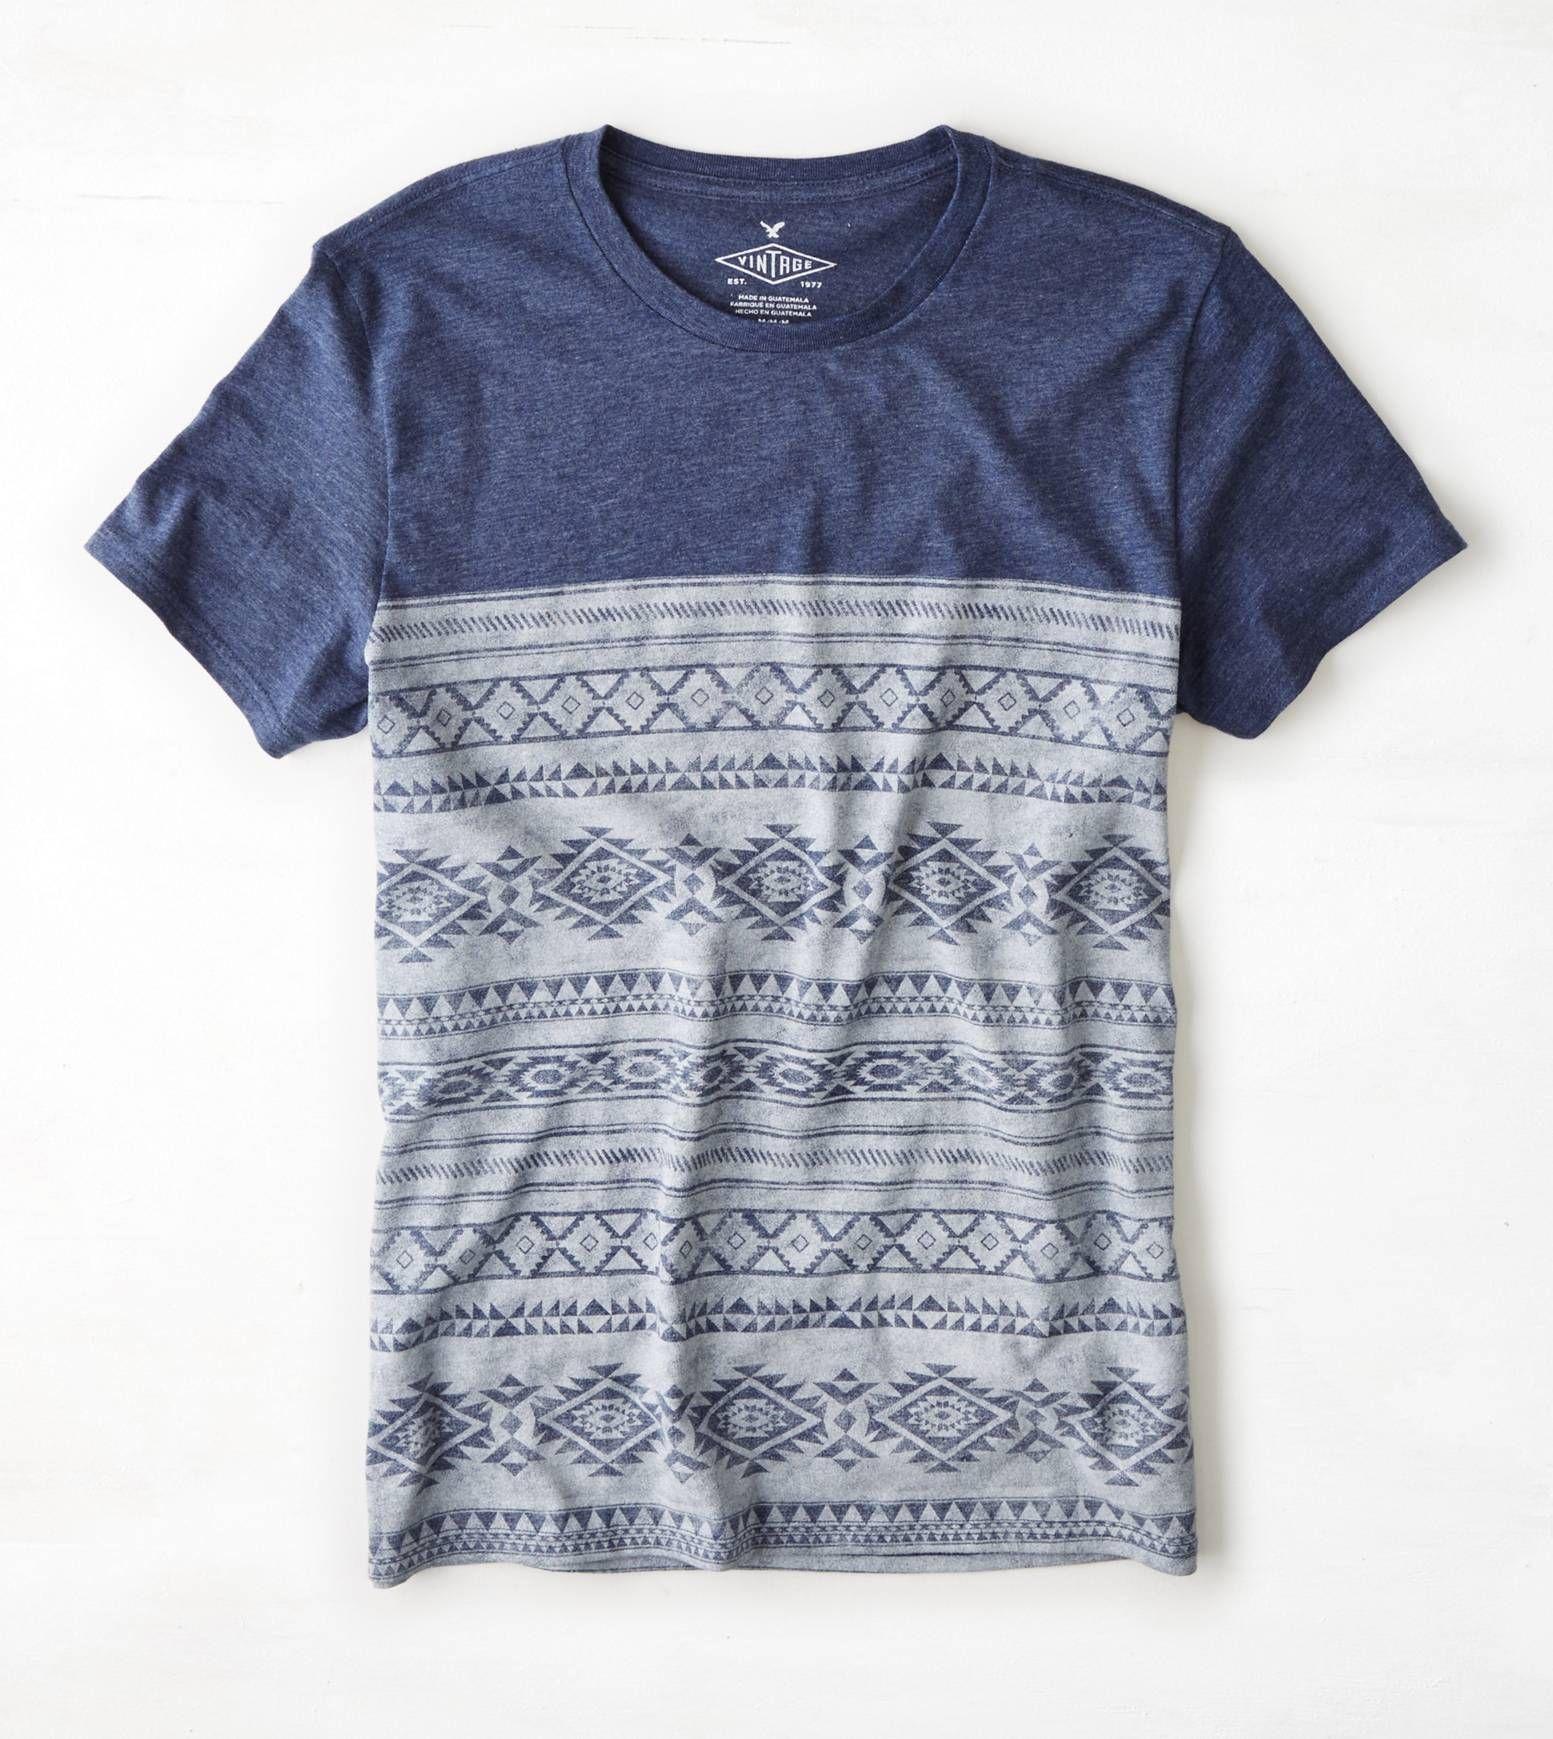 Indigo AEO Vintage Graphic T-Shirt